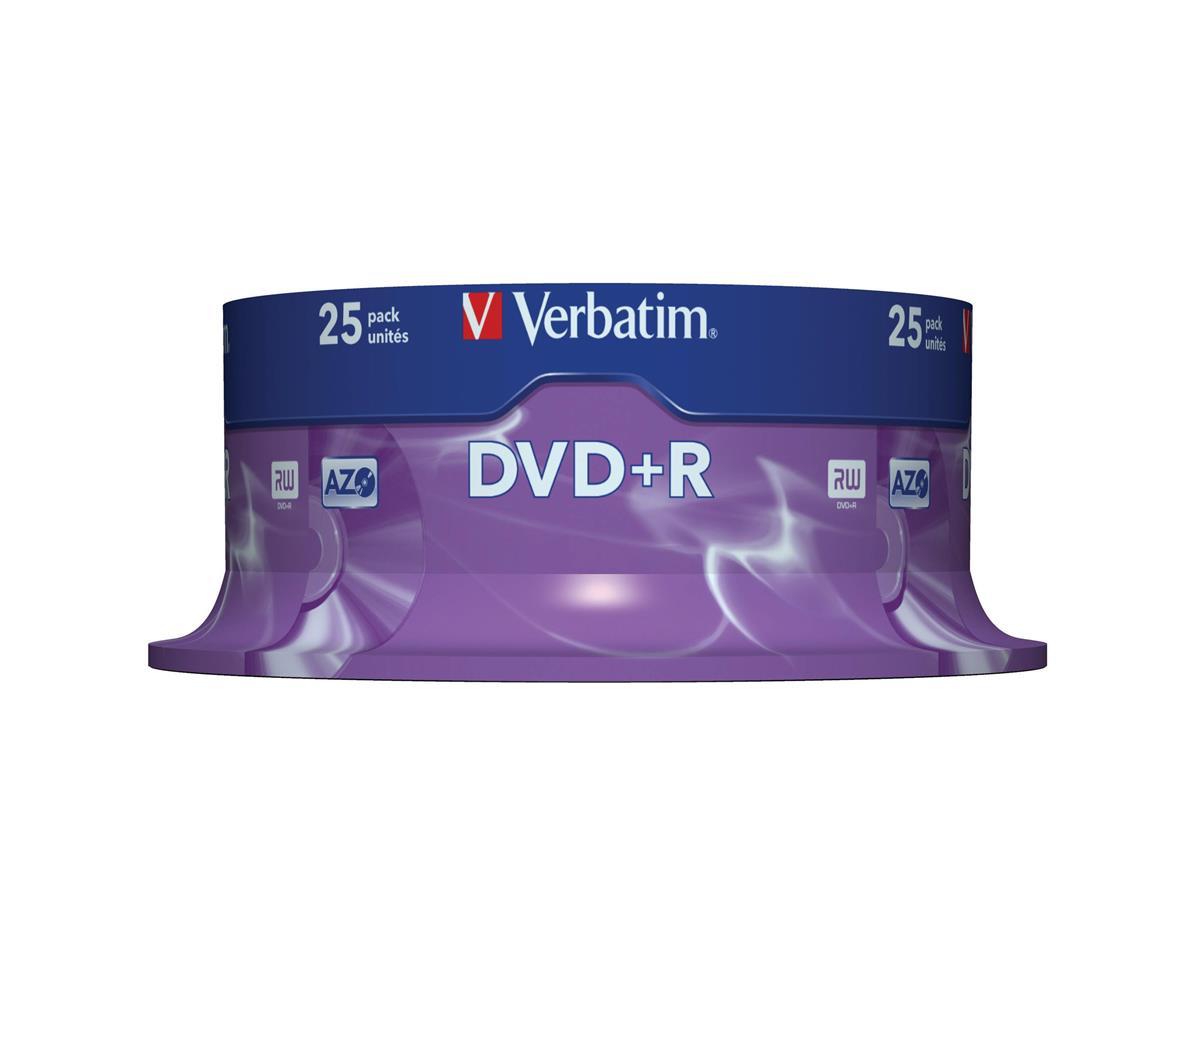 Image for Verbatim DVD+R Spindle Ref 43500-1 [Pack 25]